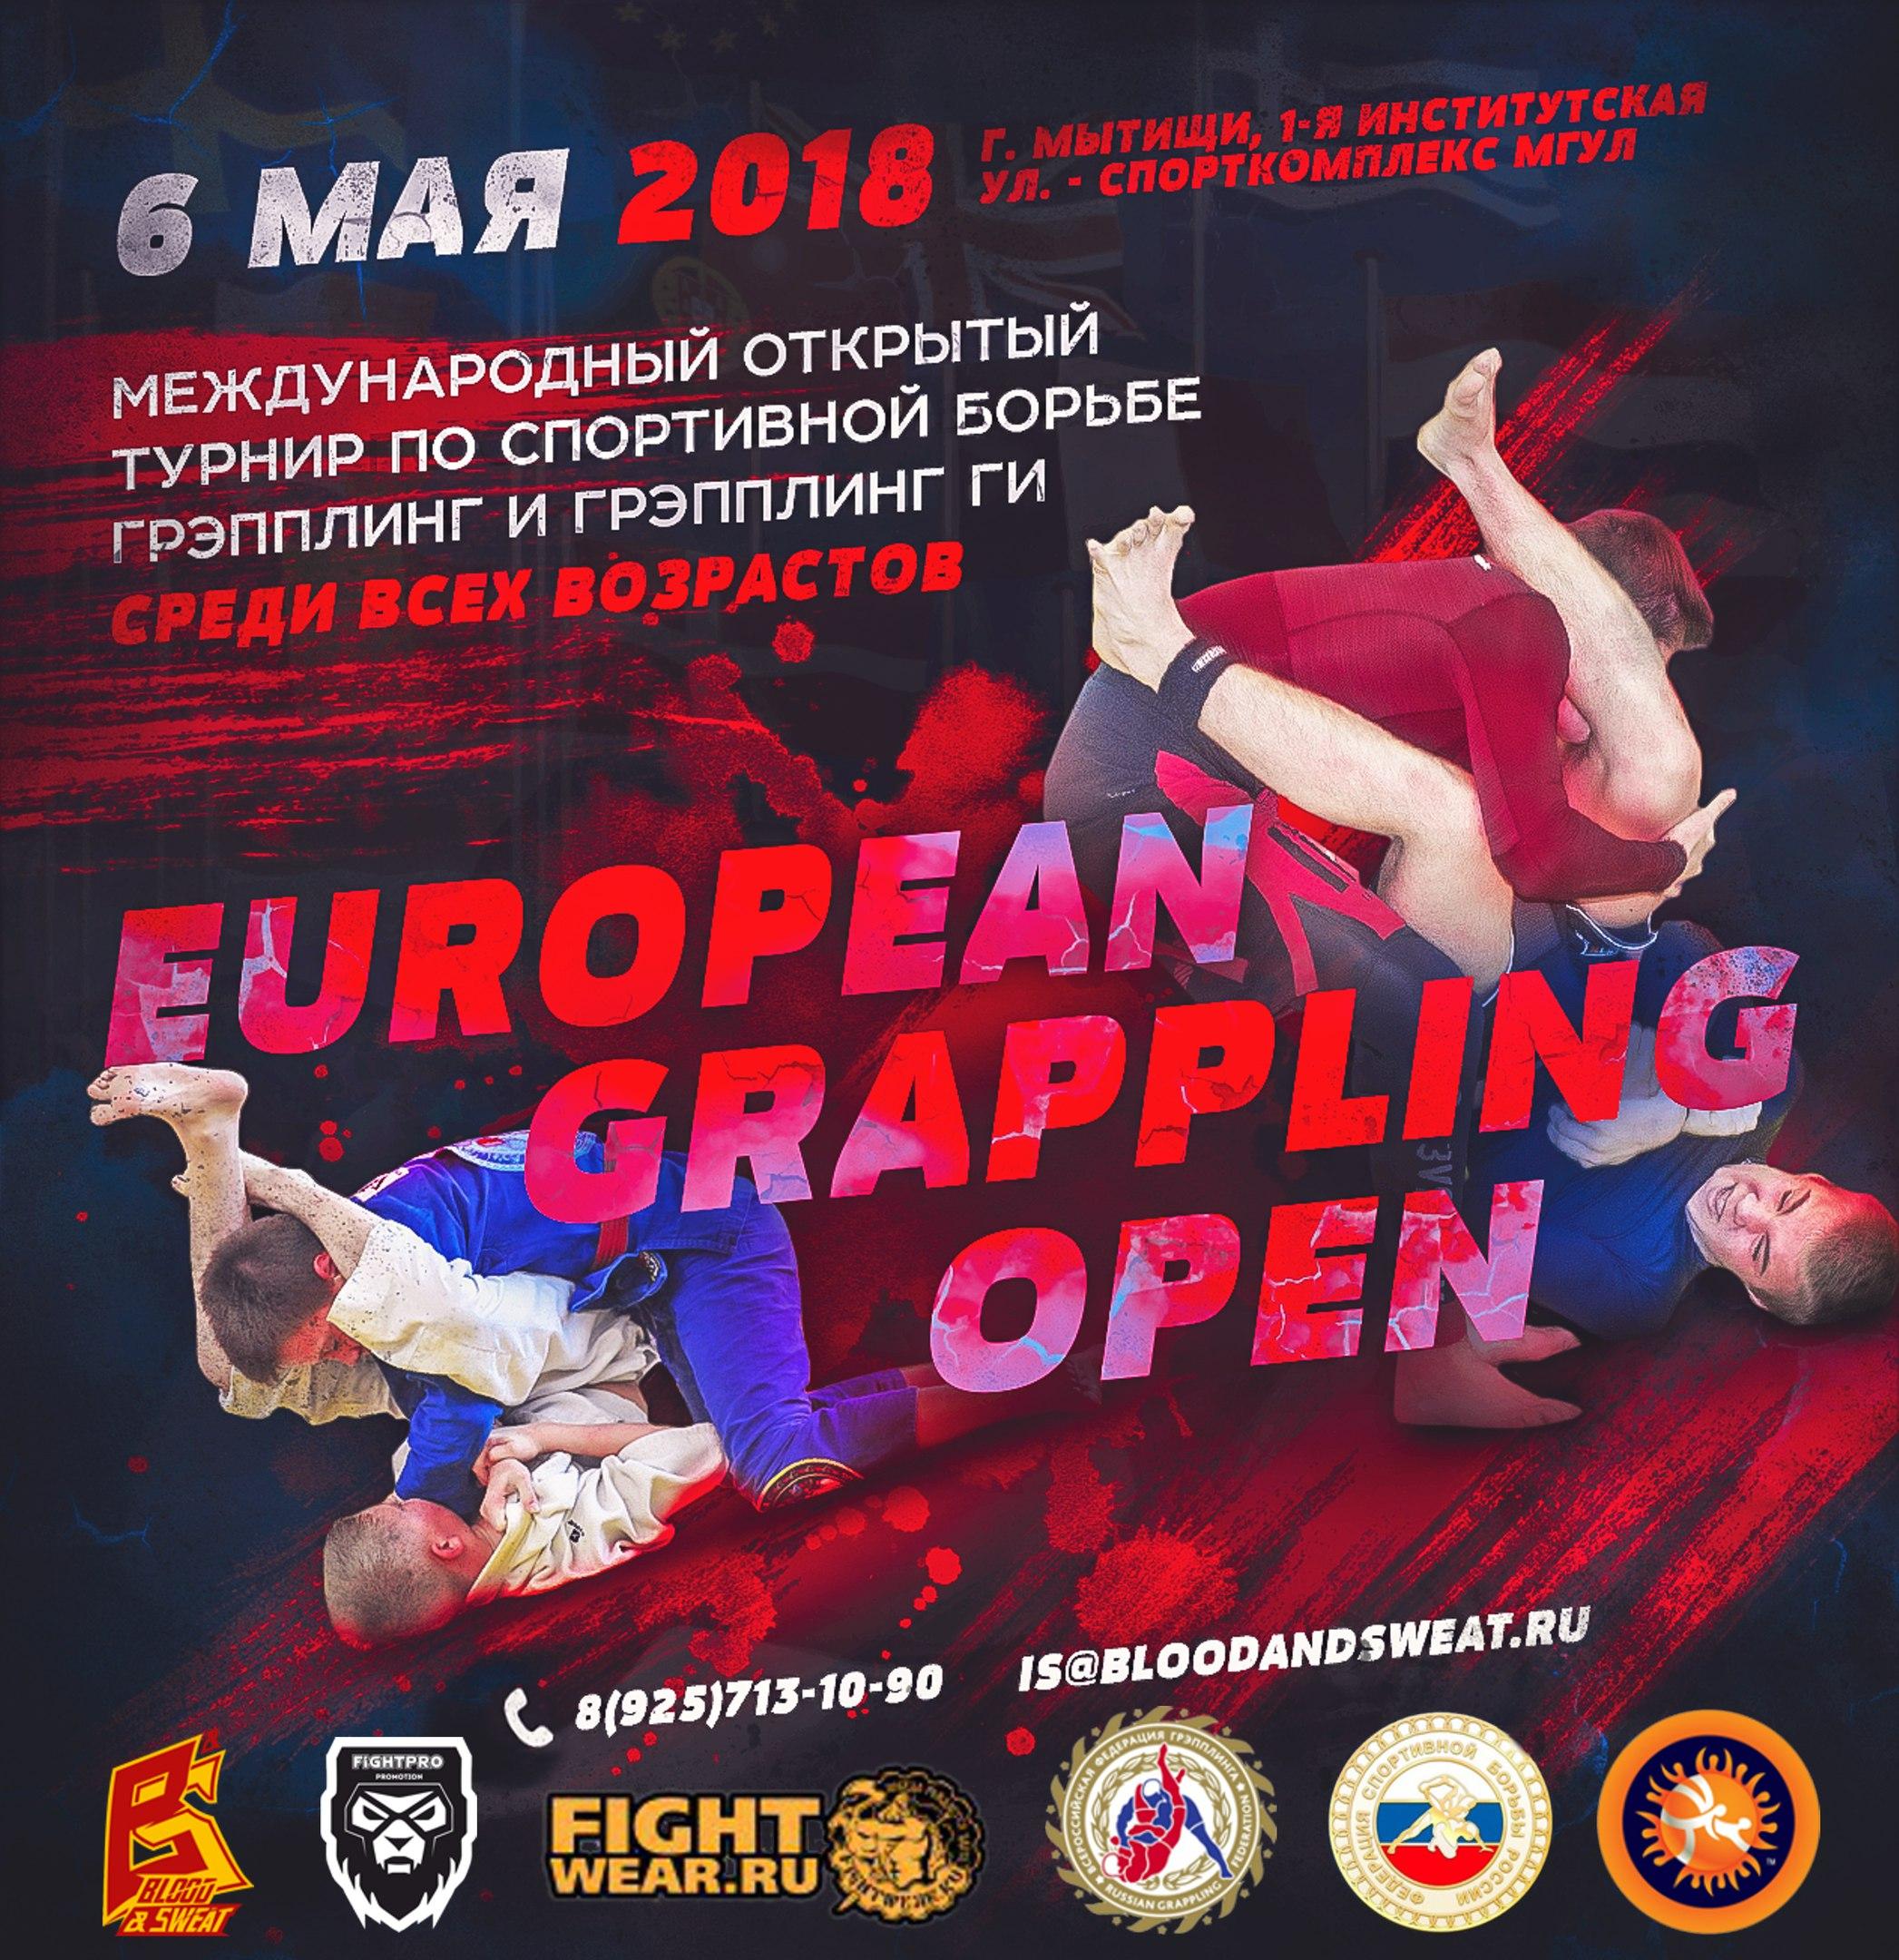 European Grappling Open